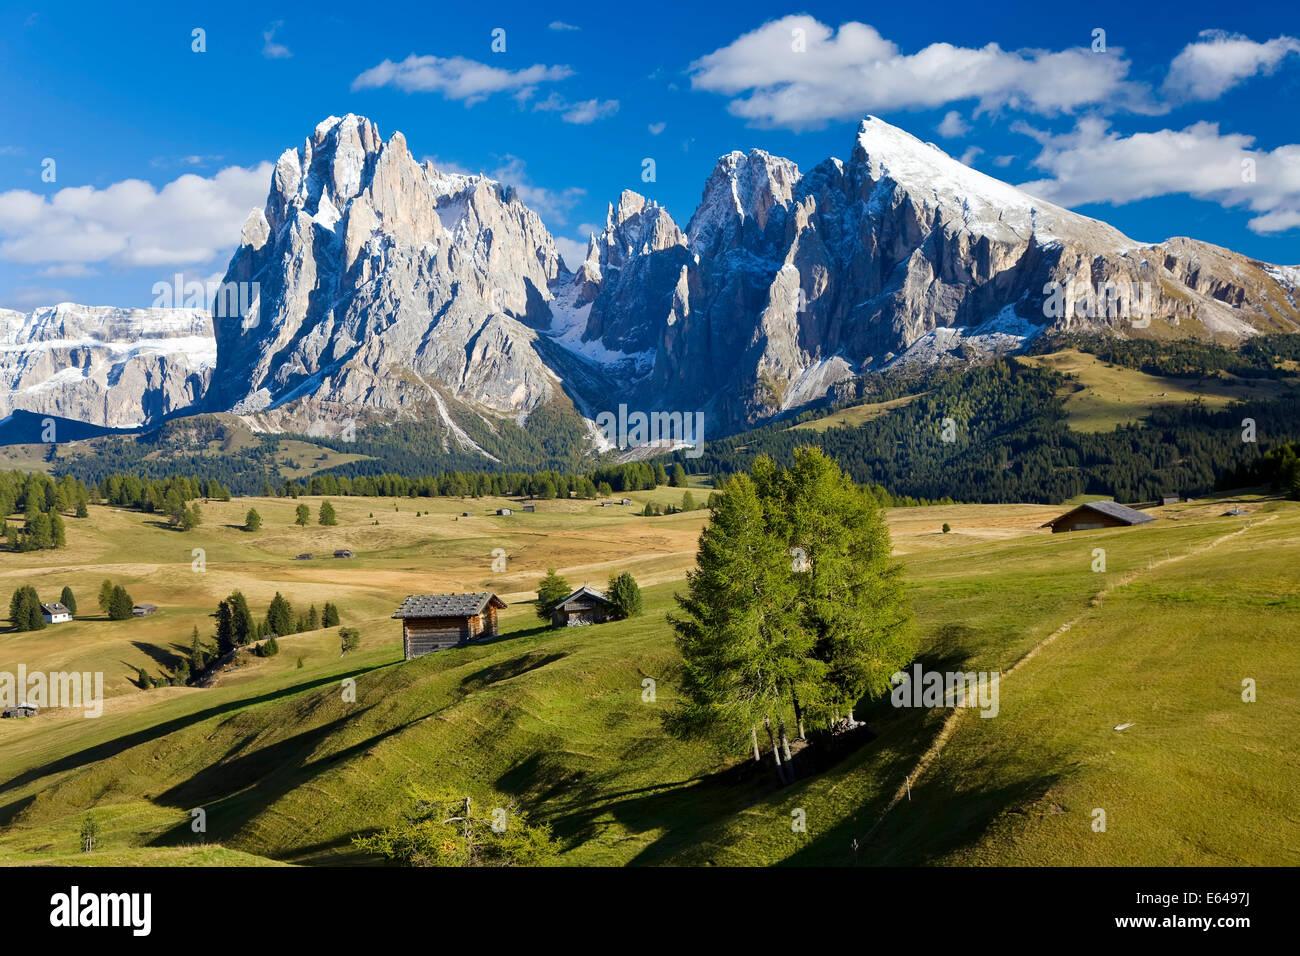 Italy, Italia Trentino-Alto Adige, South Tyrol Bolzano district Alpe di Siusi, Seiser Alm - Stock Image